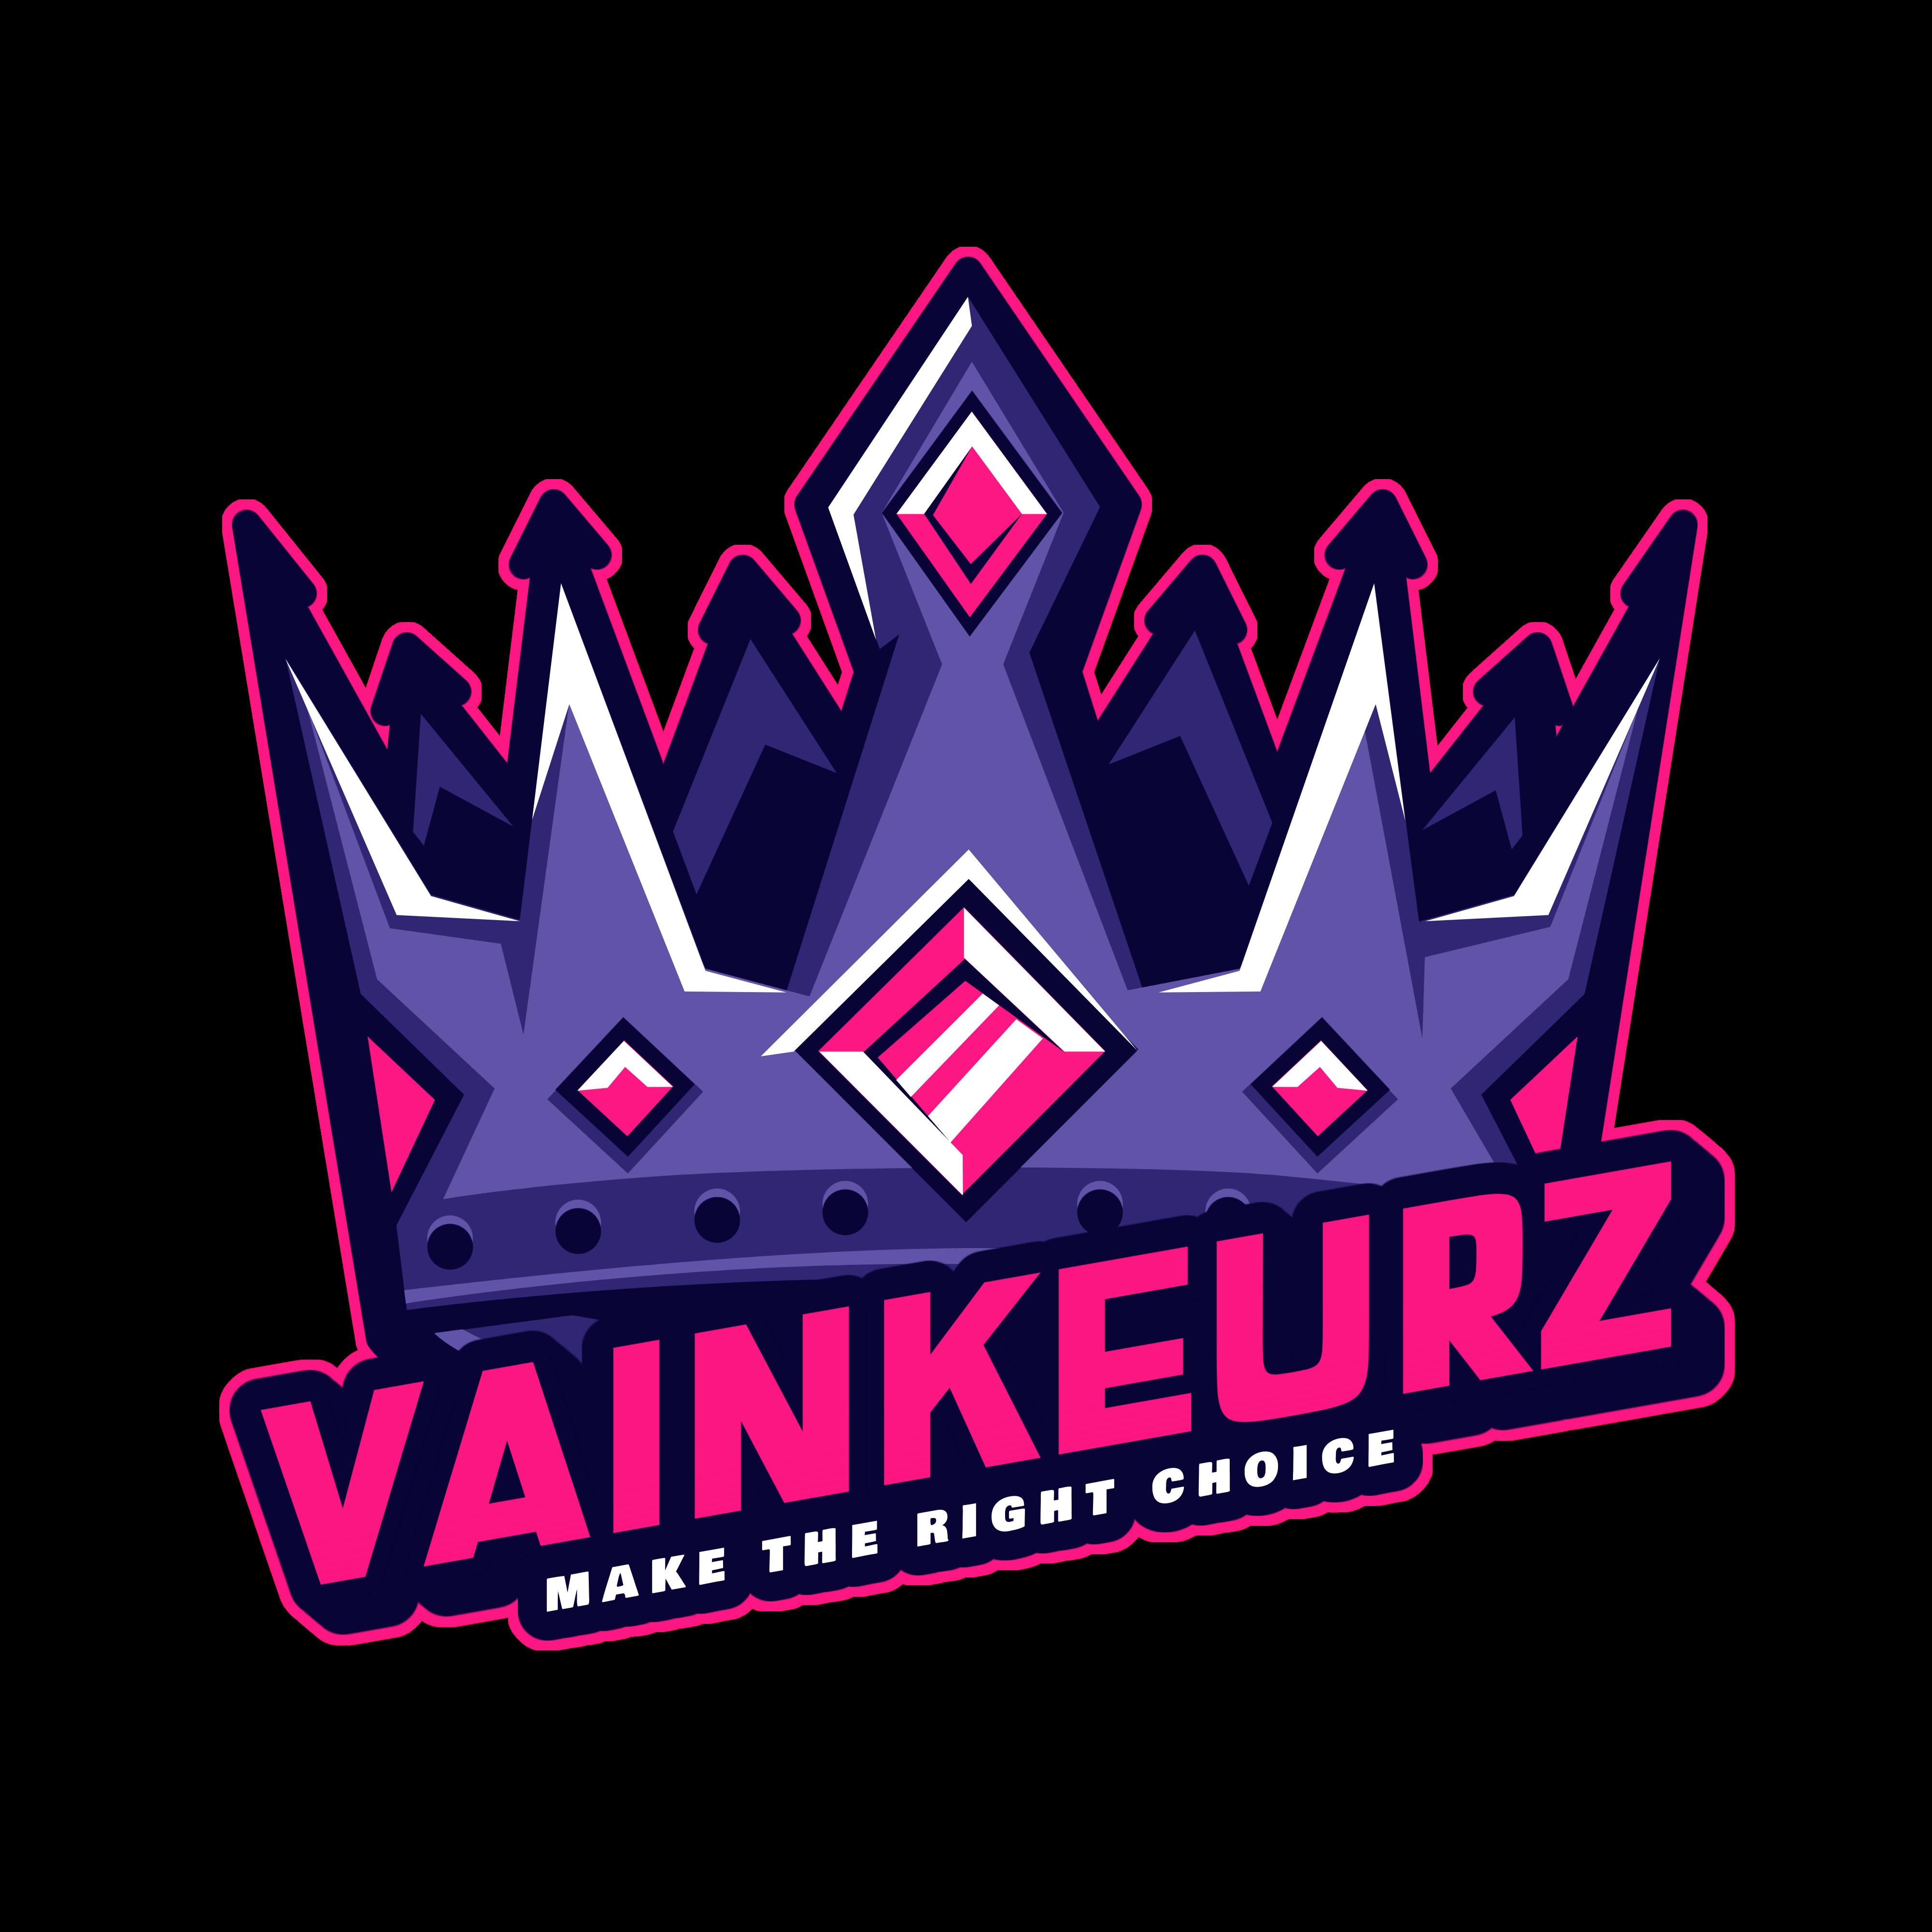 VAINKEURZ logo